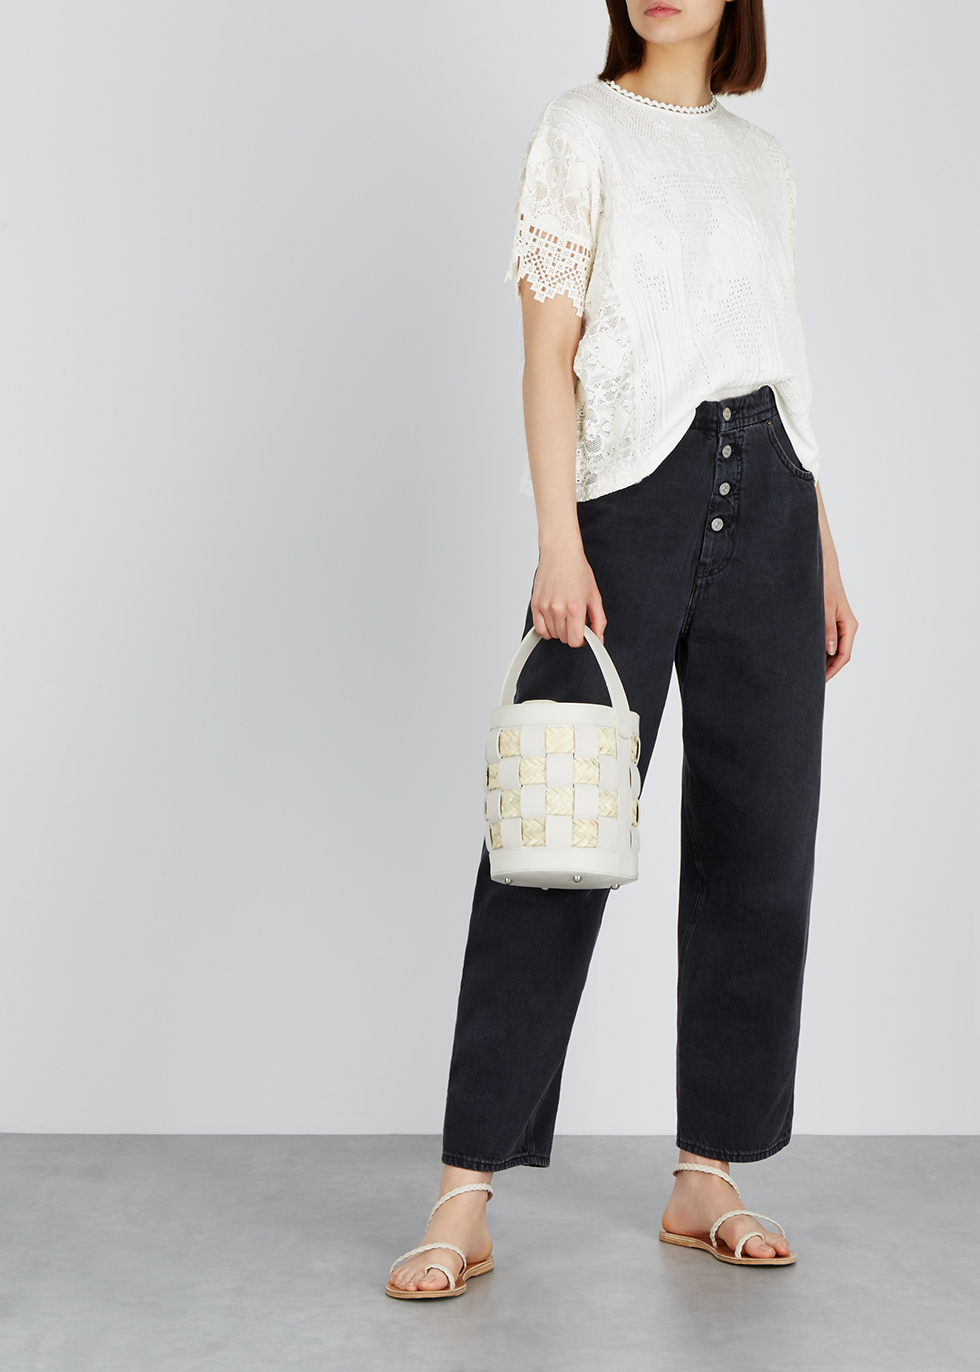 White stretch-knit top - HIGH